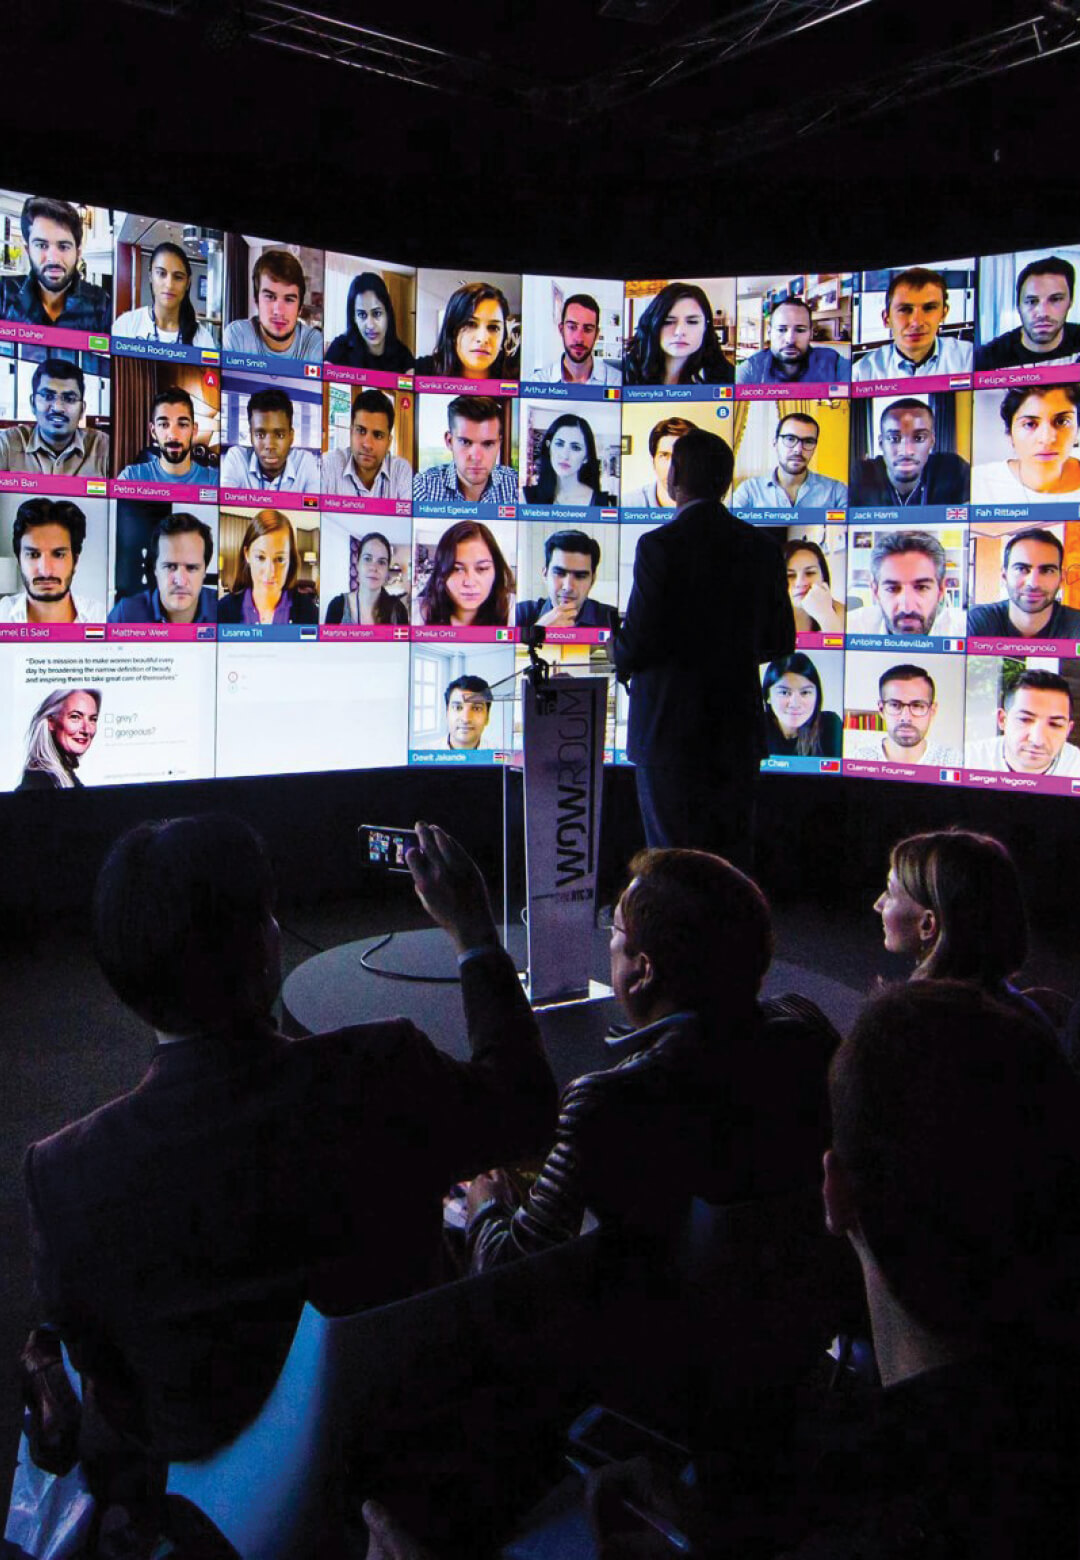 IE Business School's virtual classroom envisions a new model for education | Digital Legacies | Julius Wiedemann | STIRworld